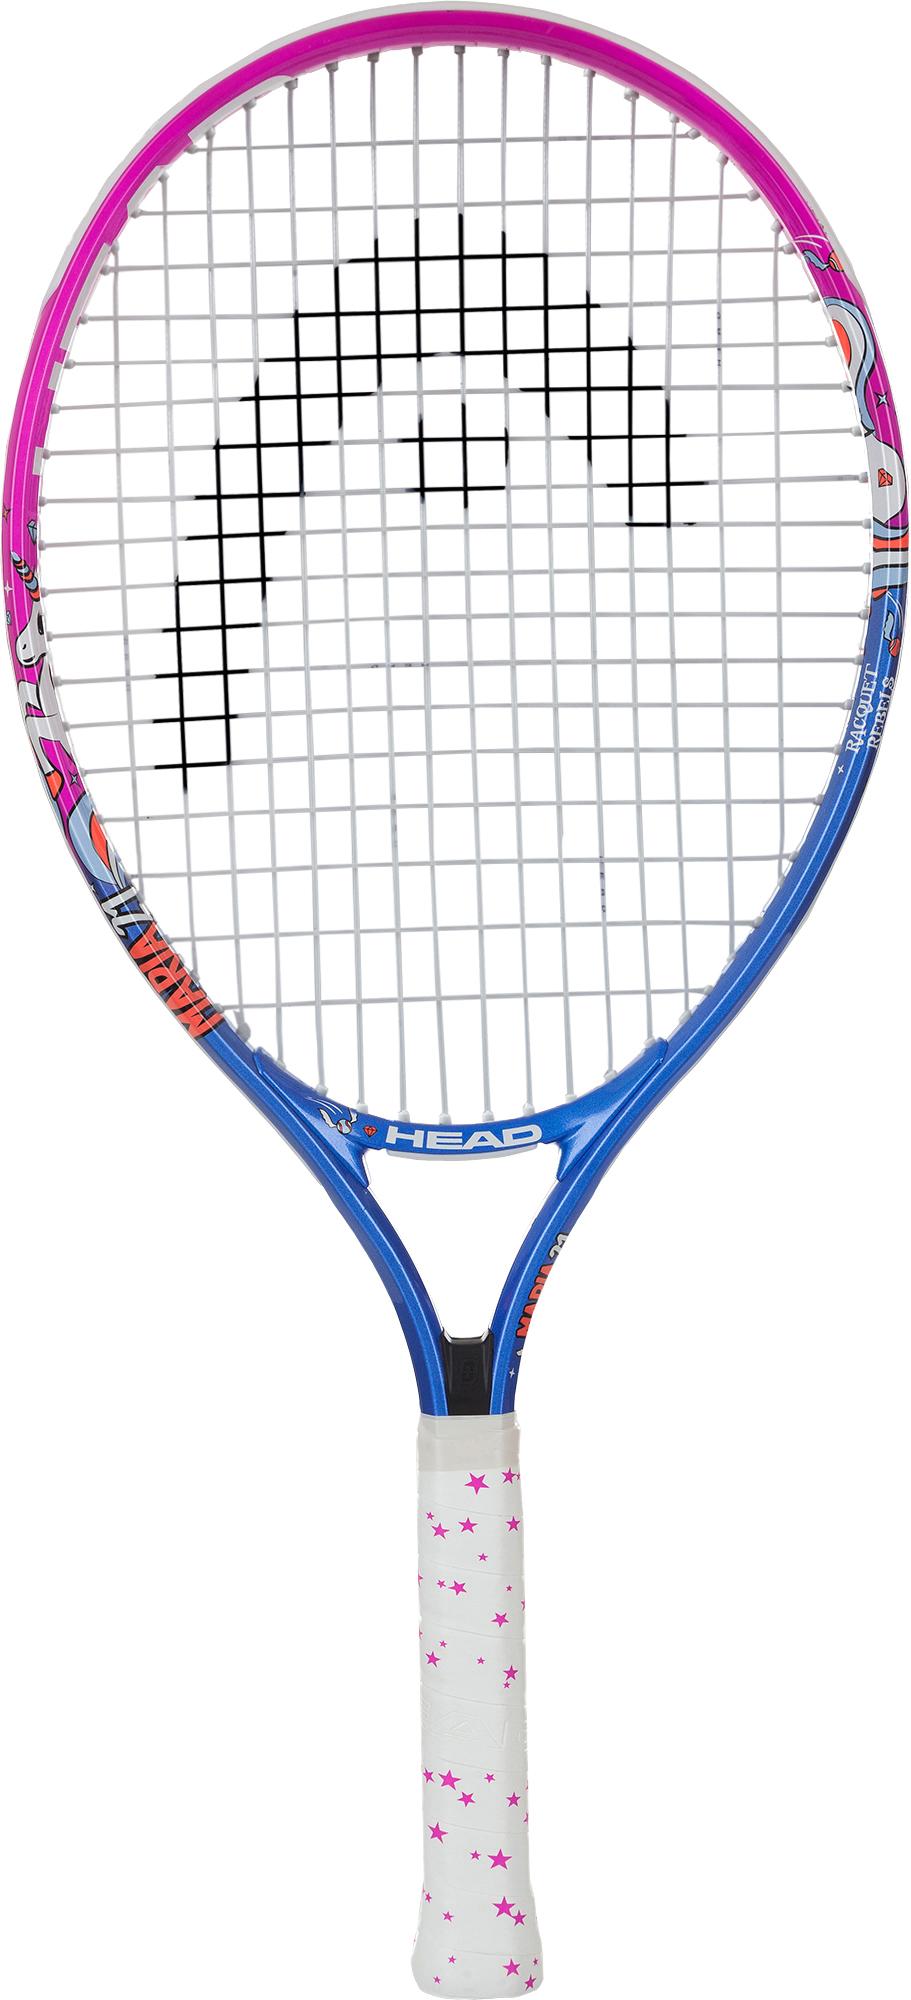 Head Ракетка для большого тенниса детская Head Maria 21, размер Без размера цены онлайн